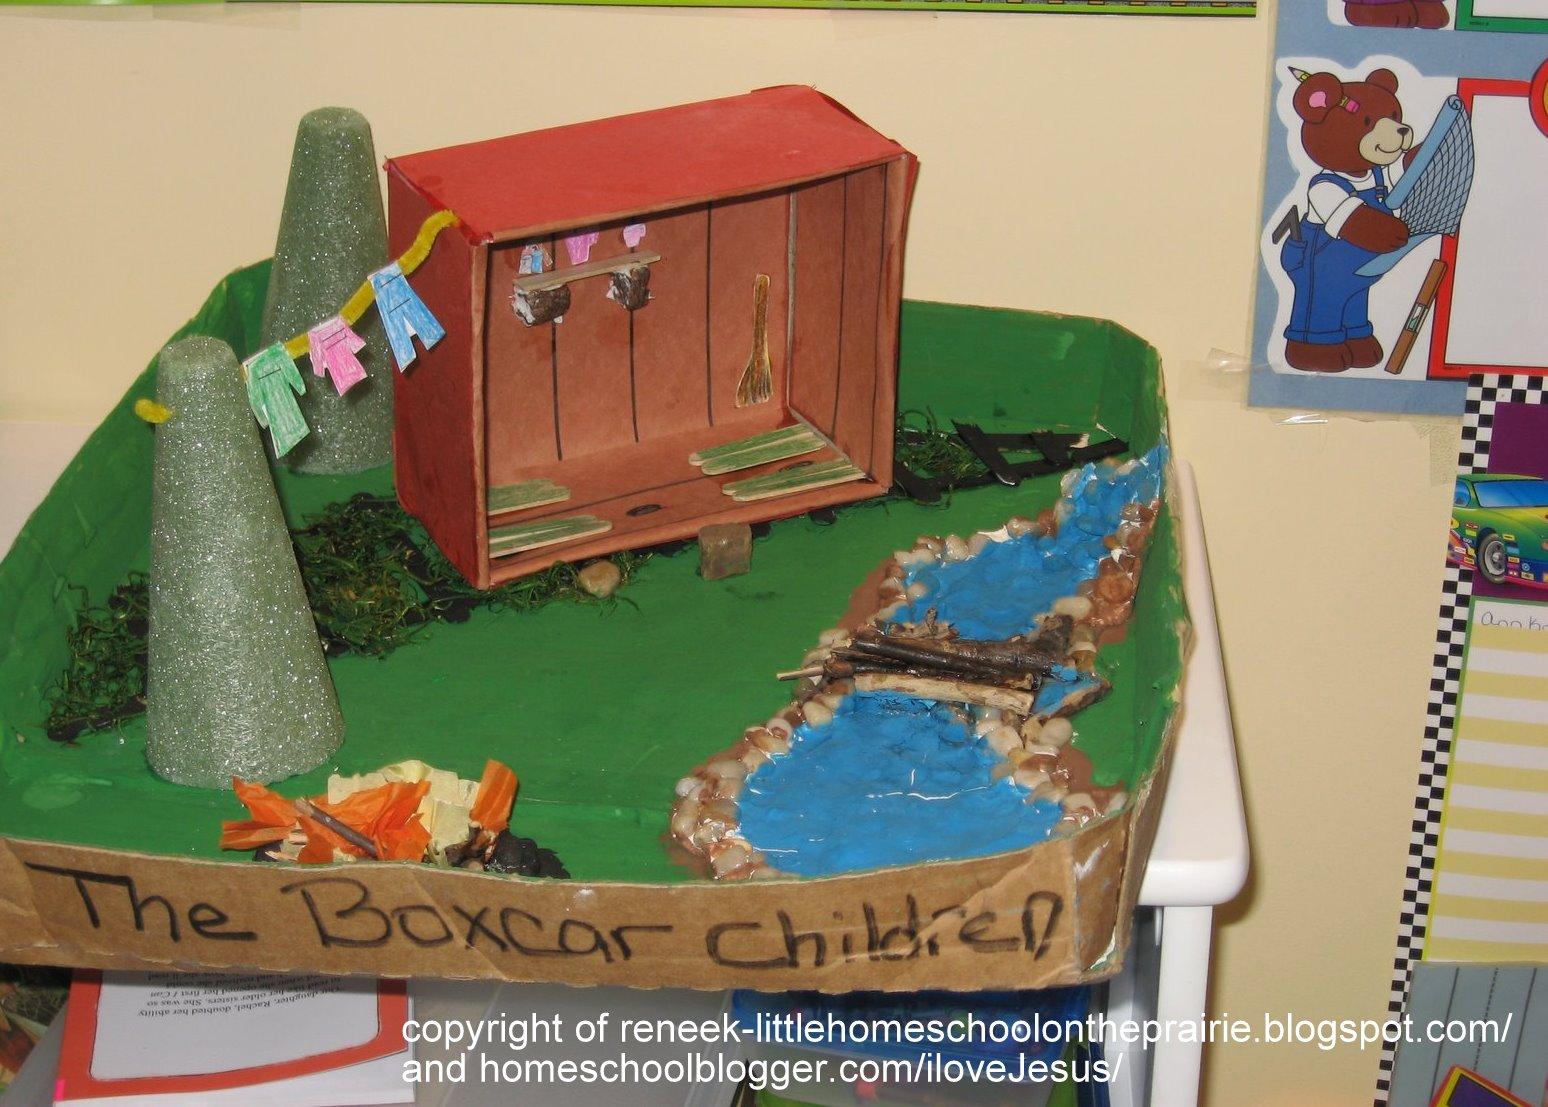 Kids Diorama With Details: Little Homeschool On The Prairie: BoxCar Children Diorama